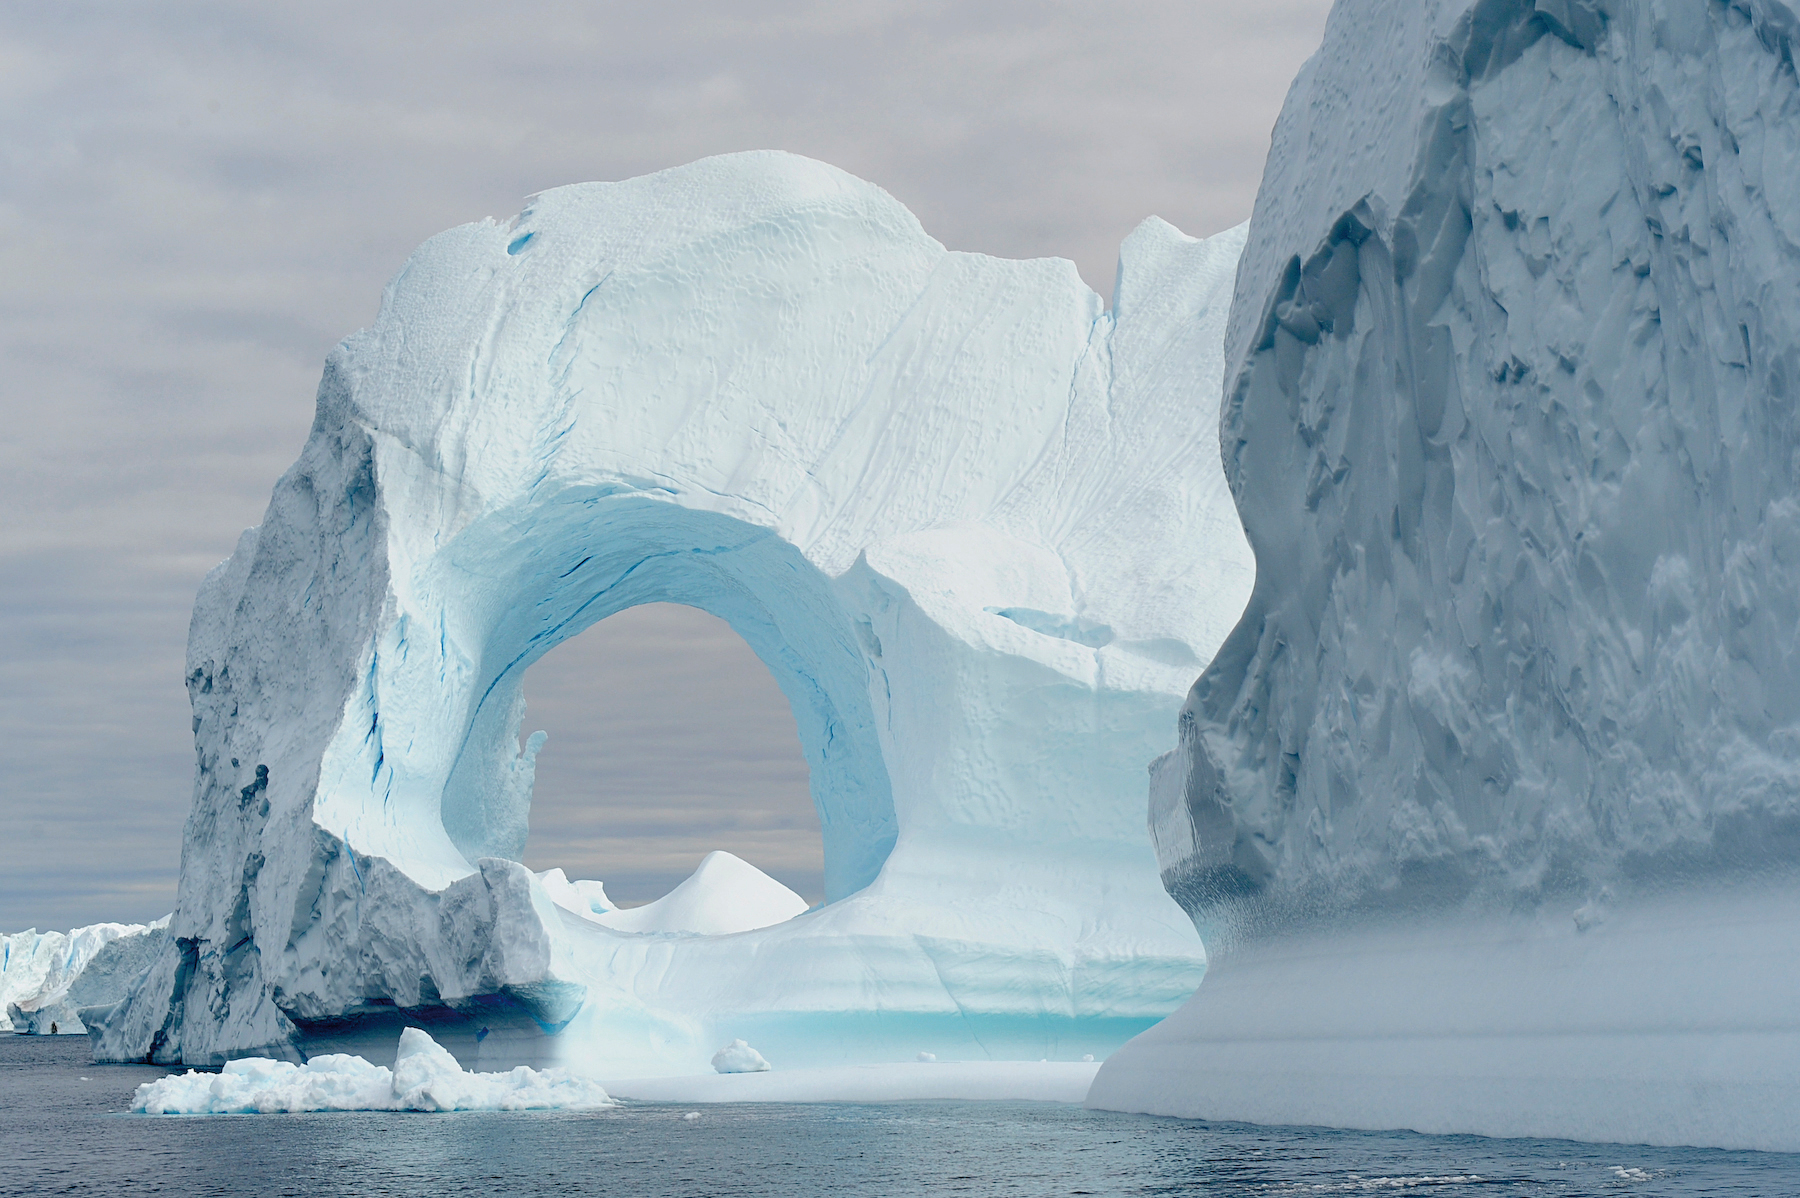 The Icebergs in Greenland's Disko Bay